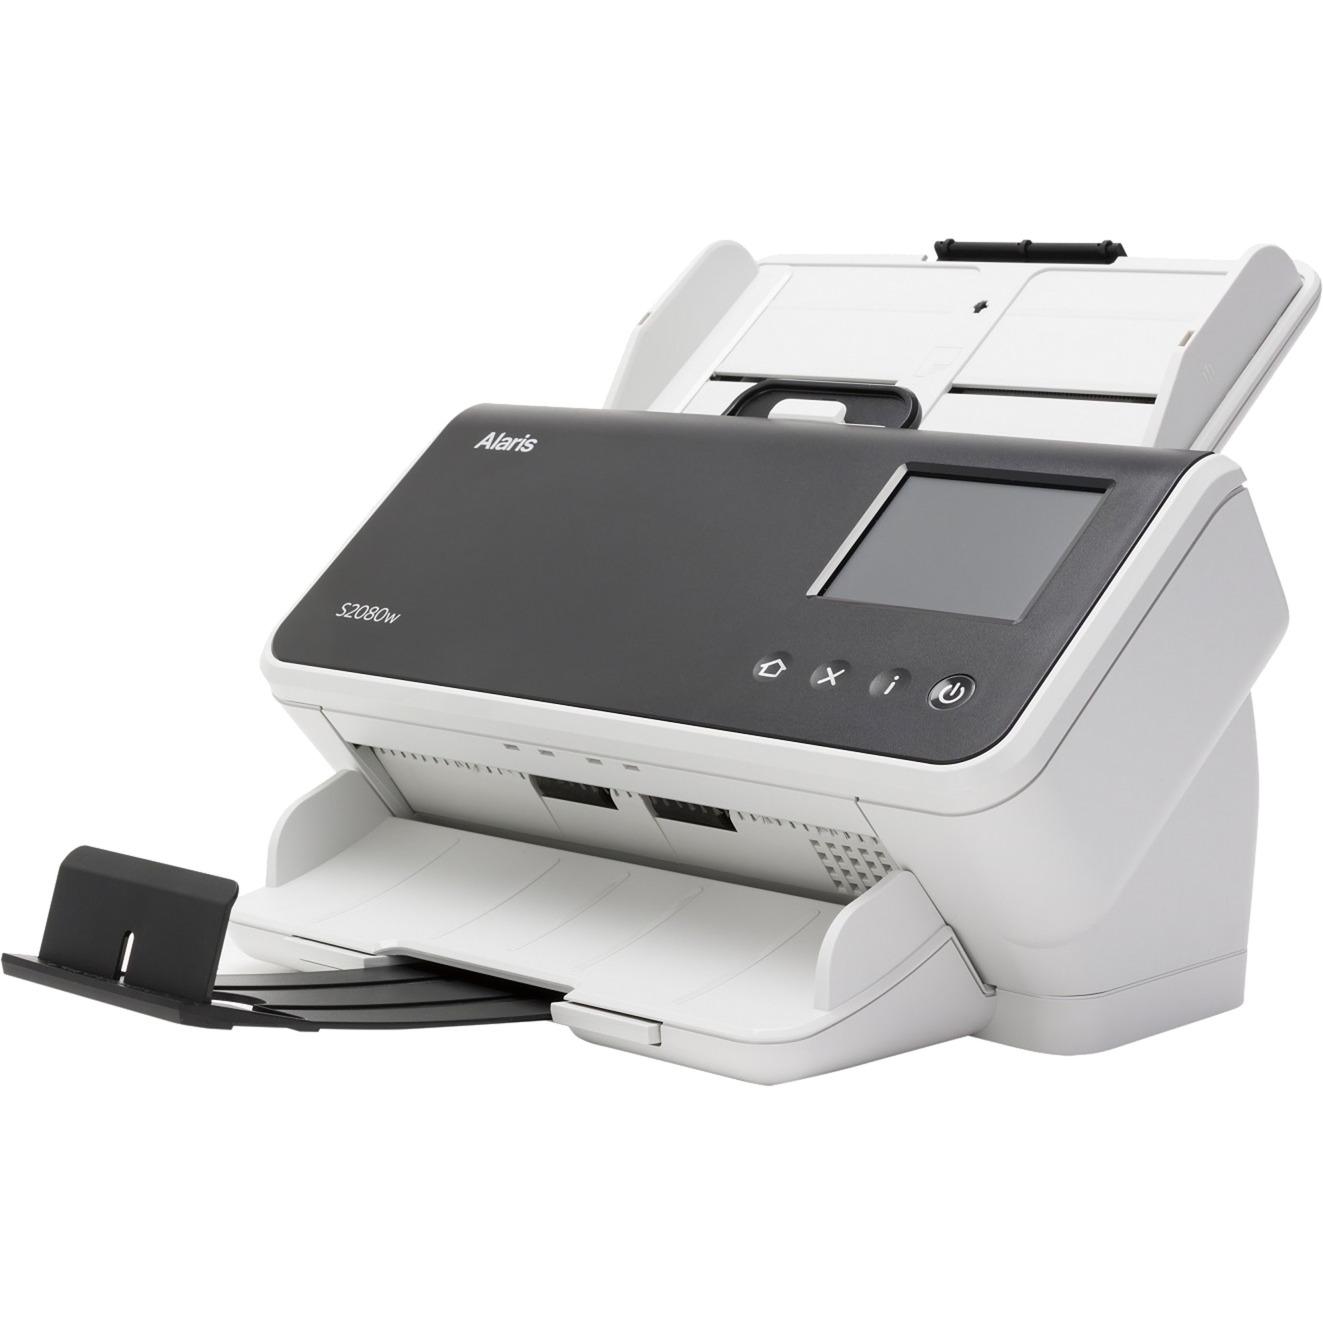 S2080W Scanner, Escáner